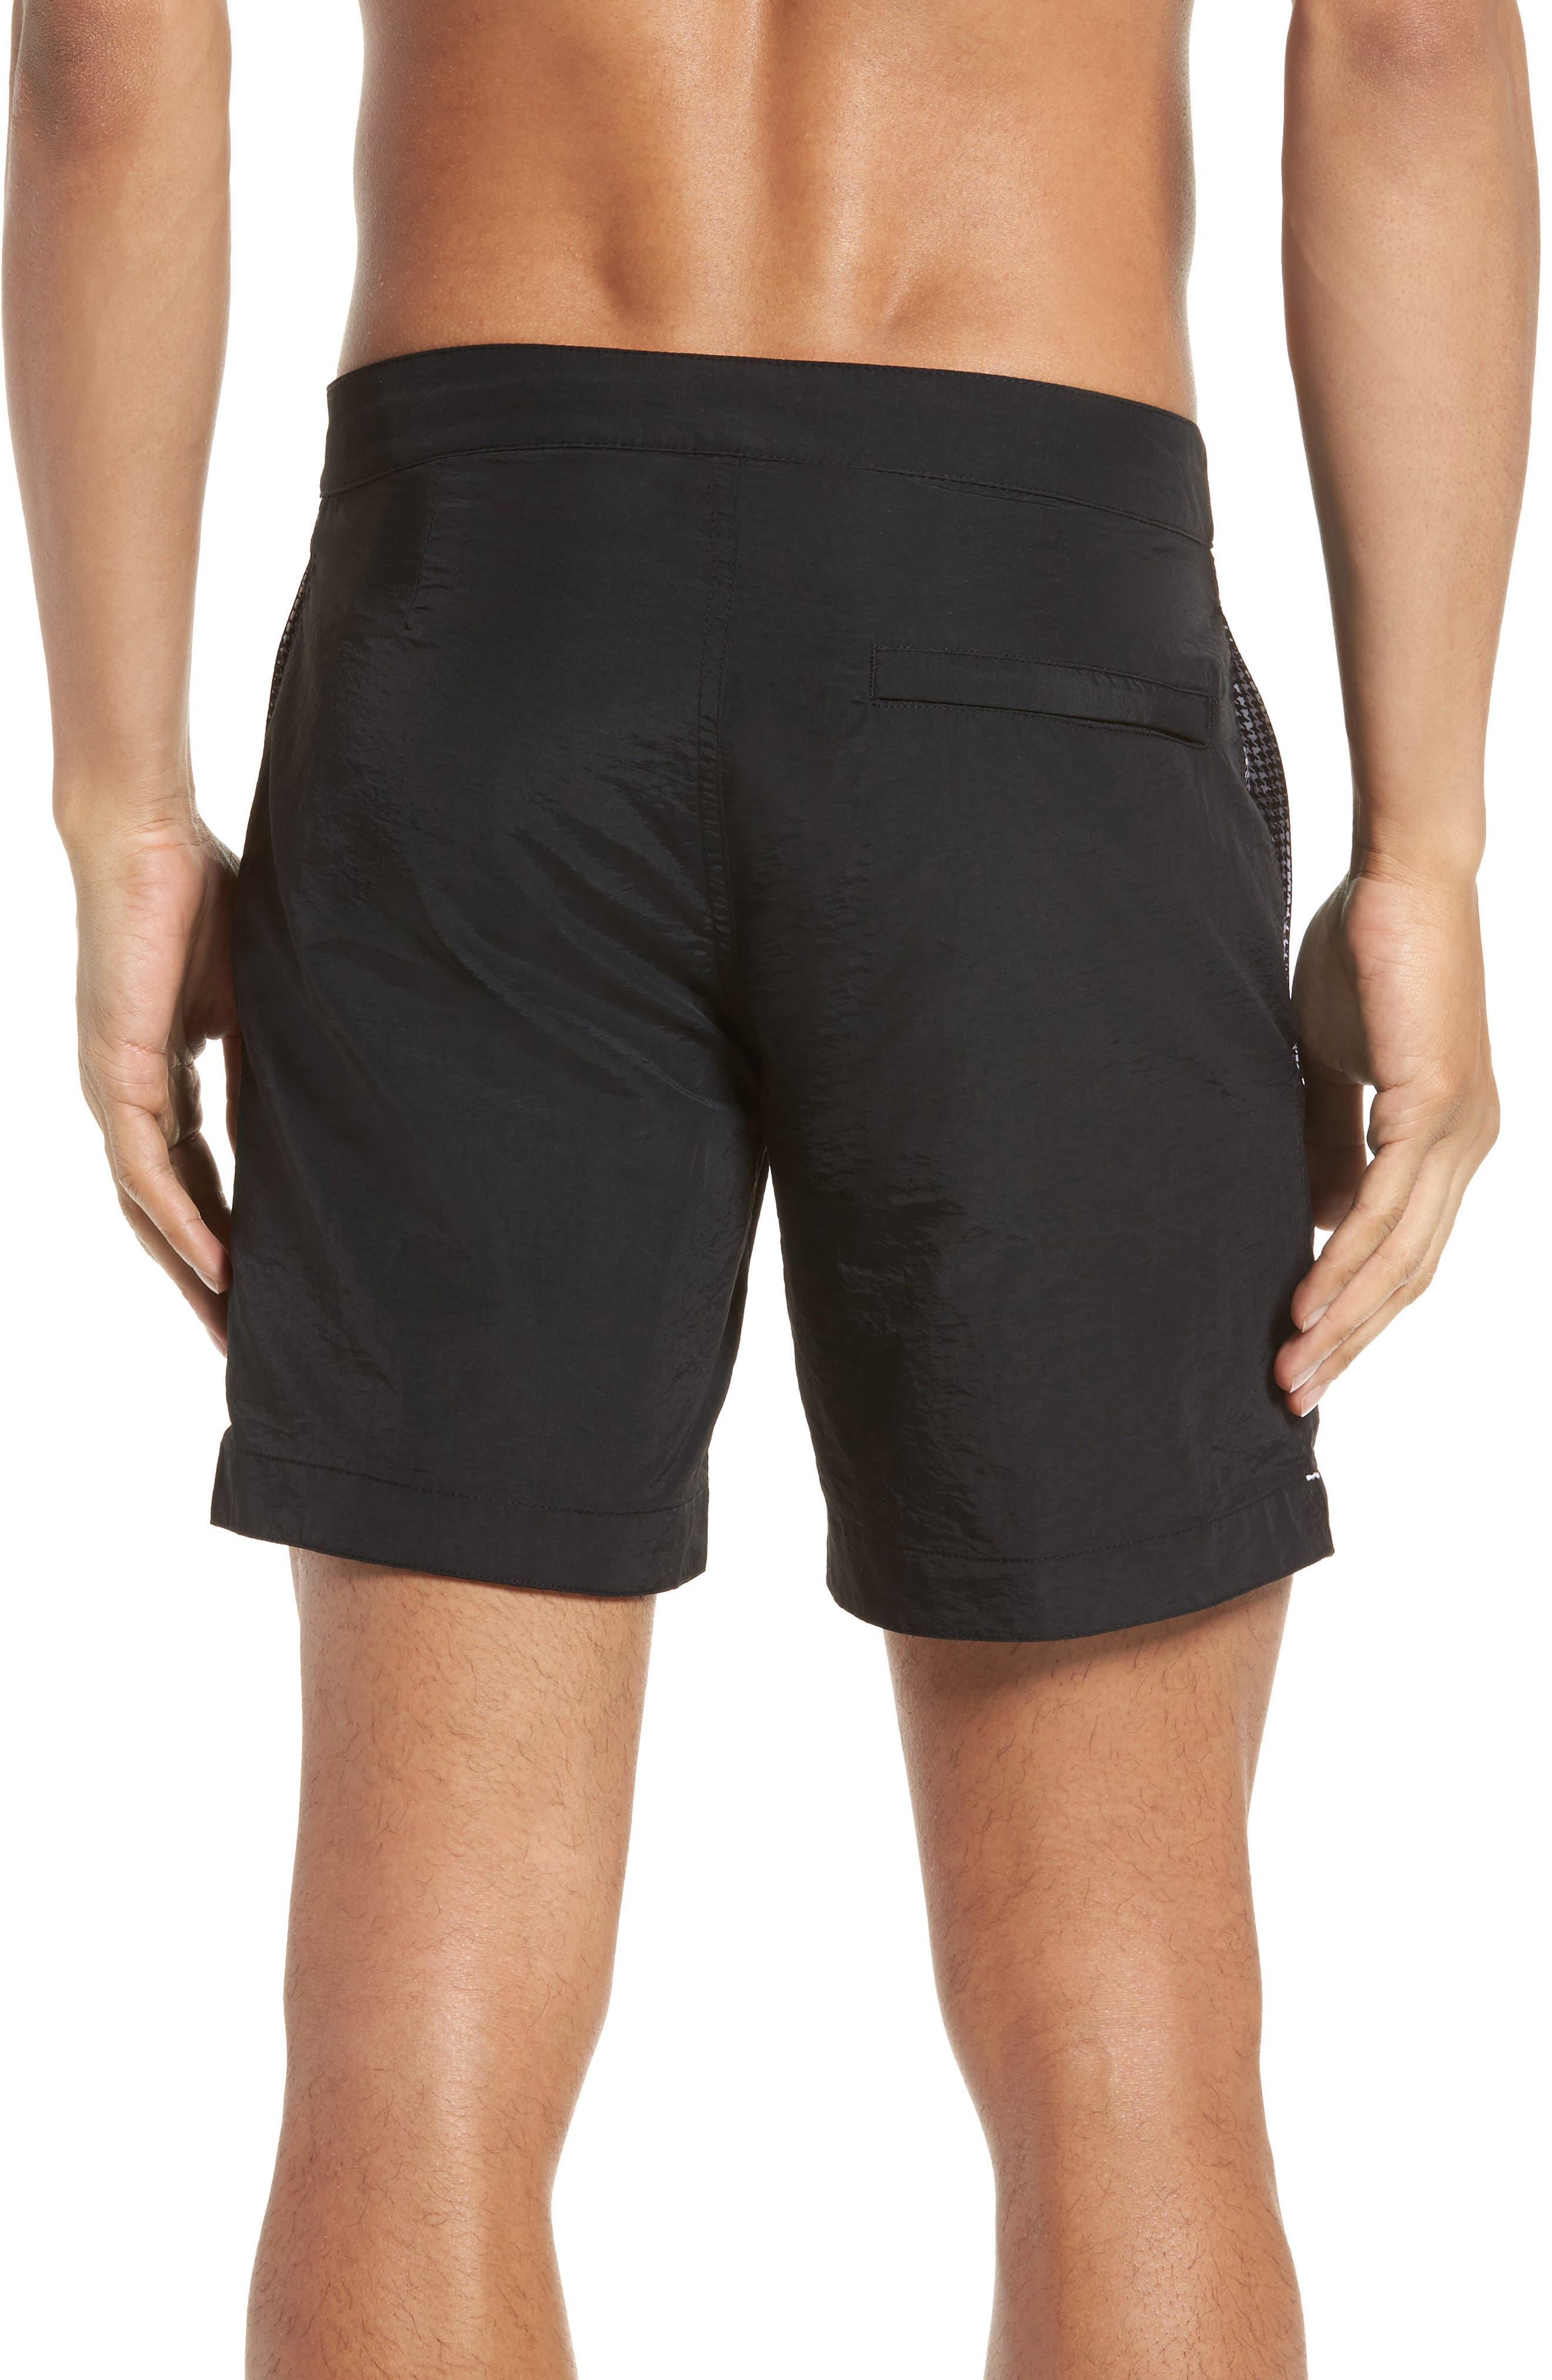 'Aruba' Tailored Fit Swim Trunks,                             Alternate thumbnail 2, color,                             MIDNIGHT BLACK SOLID